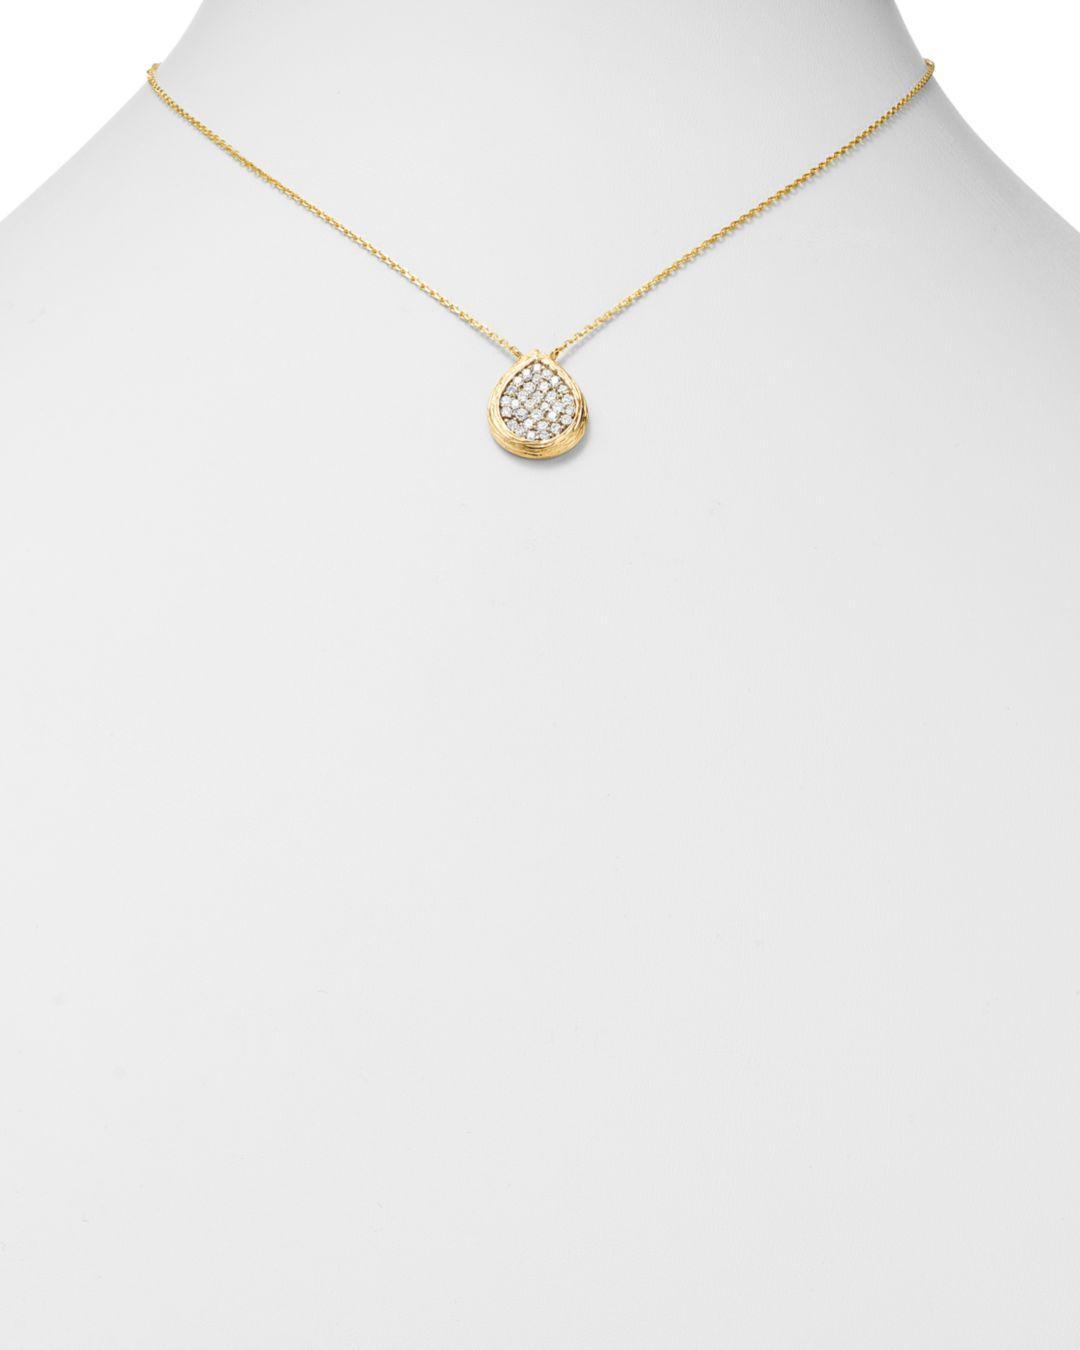 Best Designer Jewelry 14k White Gold Polished /& Textured Small Filigree Teardrop Pendant